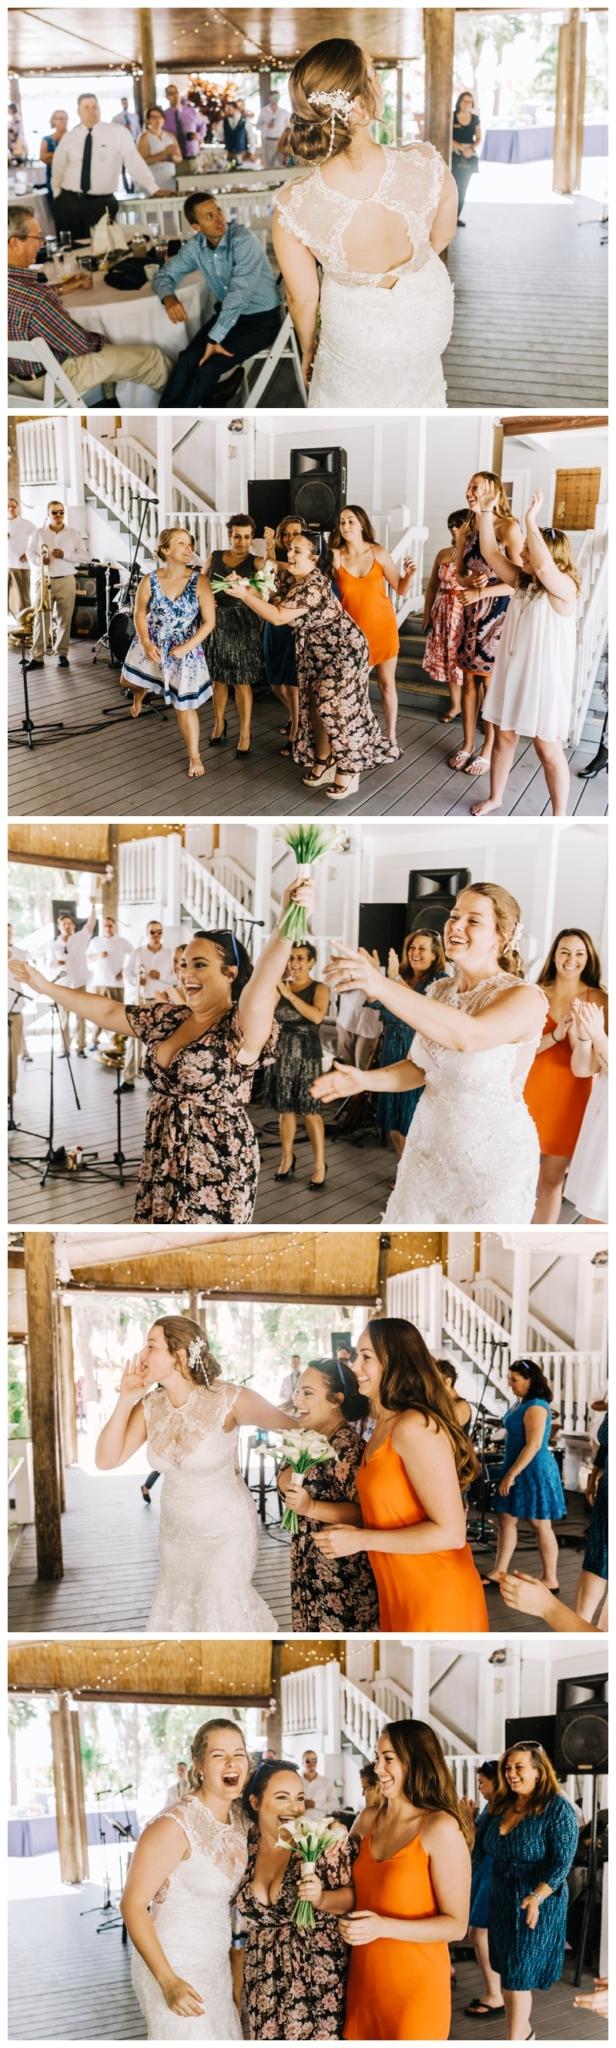 Lakeland-Wedding-Photographer_Paradise-Cove_Chantal-and-Will_Orlando_FL_0085.jpg